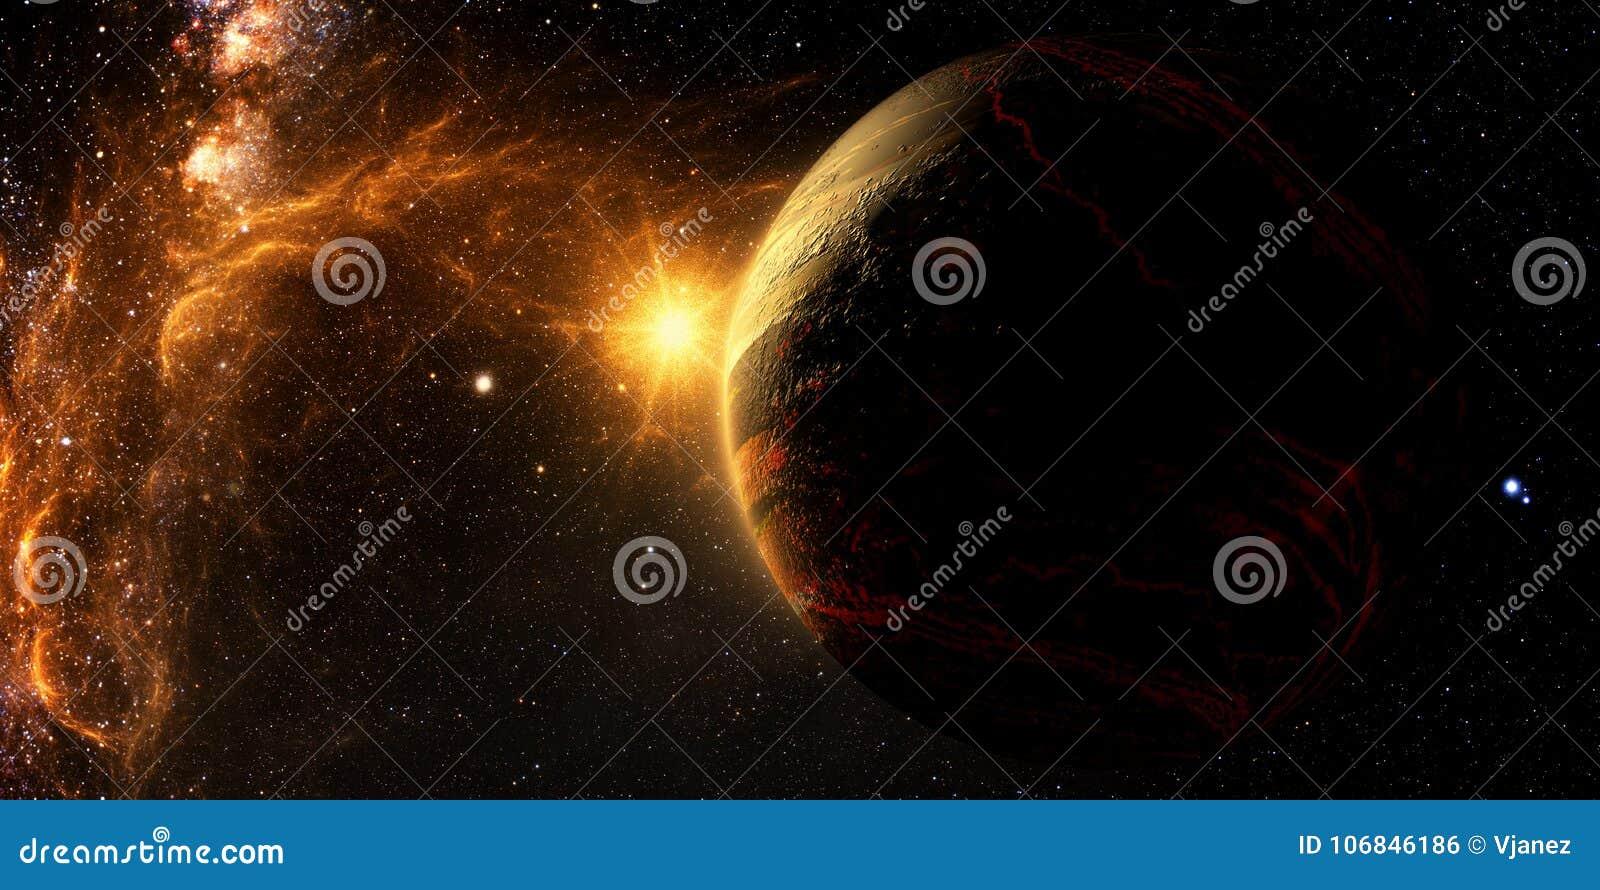 Exoplanet Exploration - Fantasy